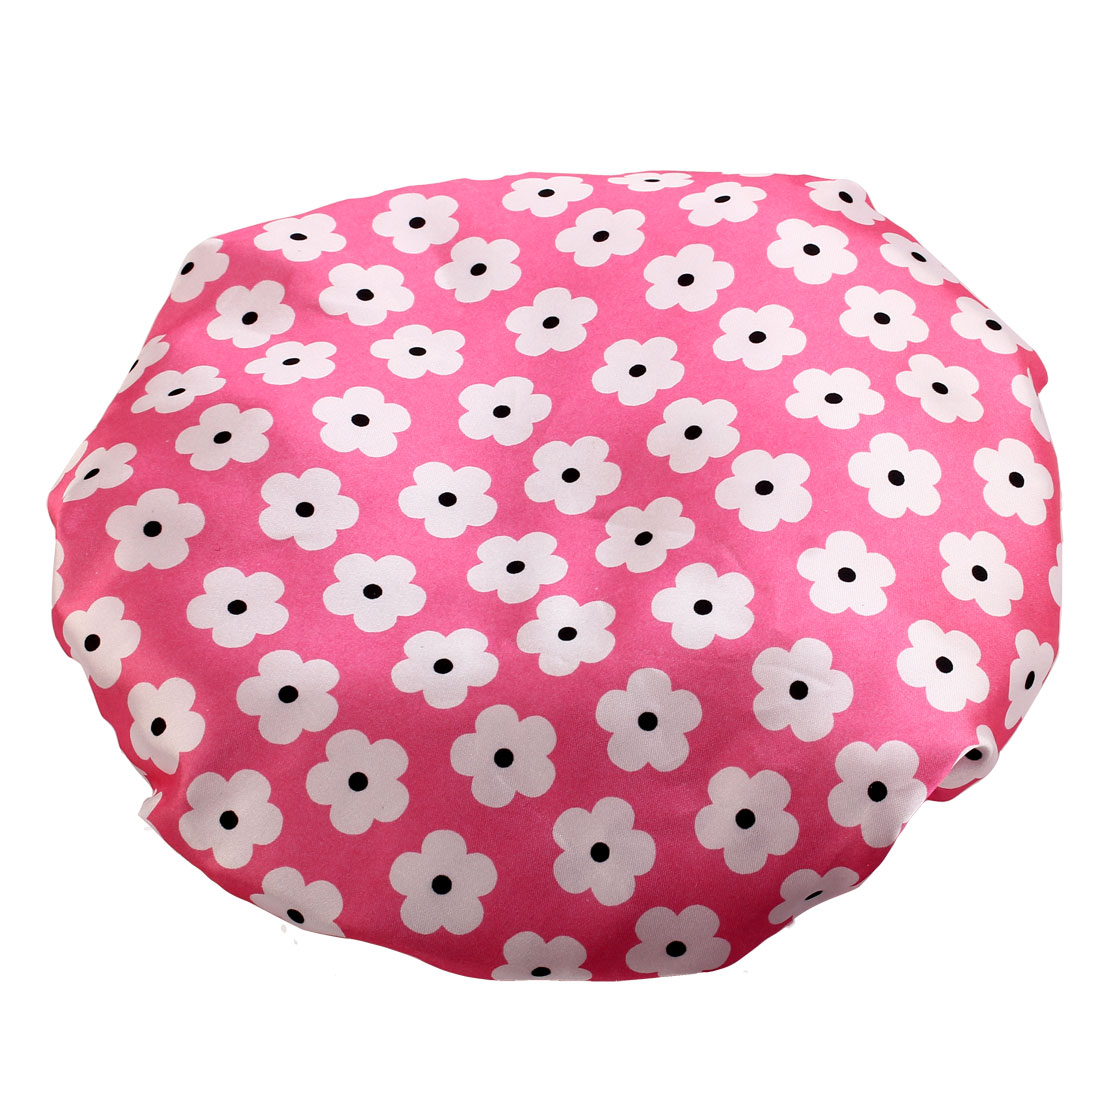 Unique BargainsWomen Polyester Flower Pattern Hair Protector Water Resistant Spa Shower Cap